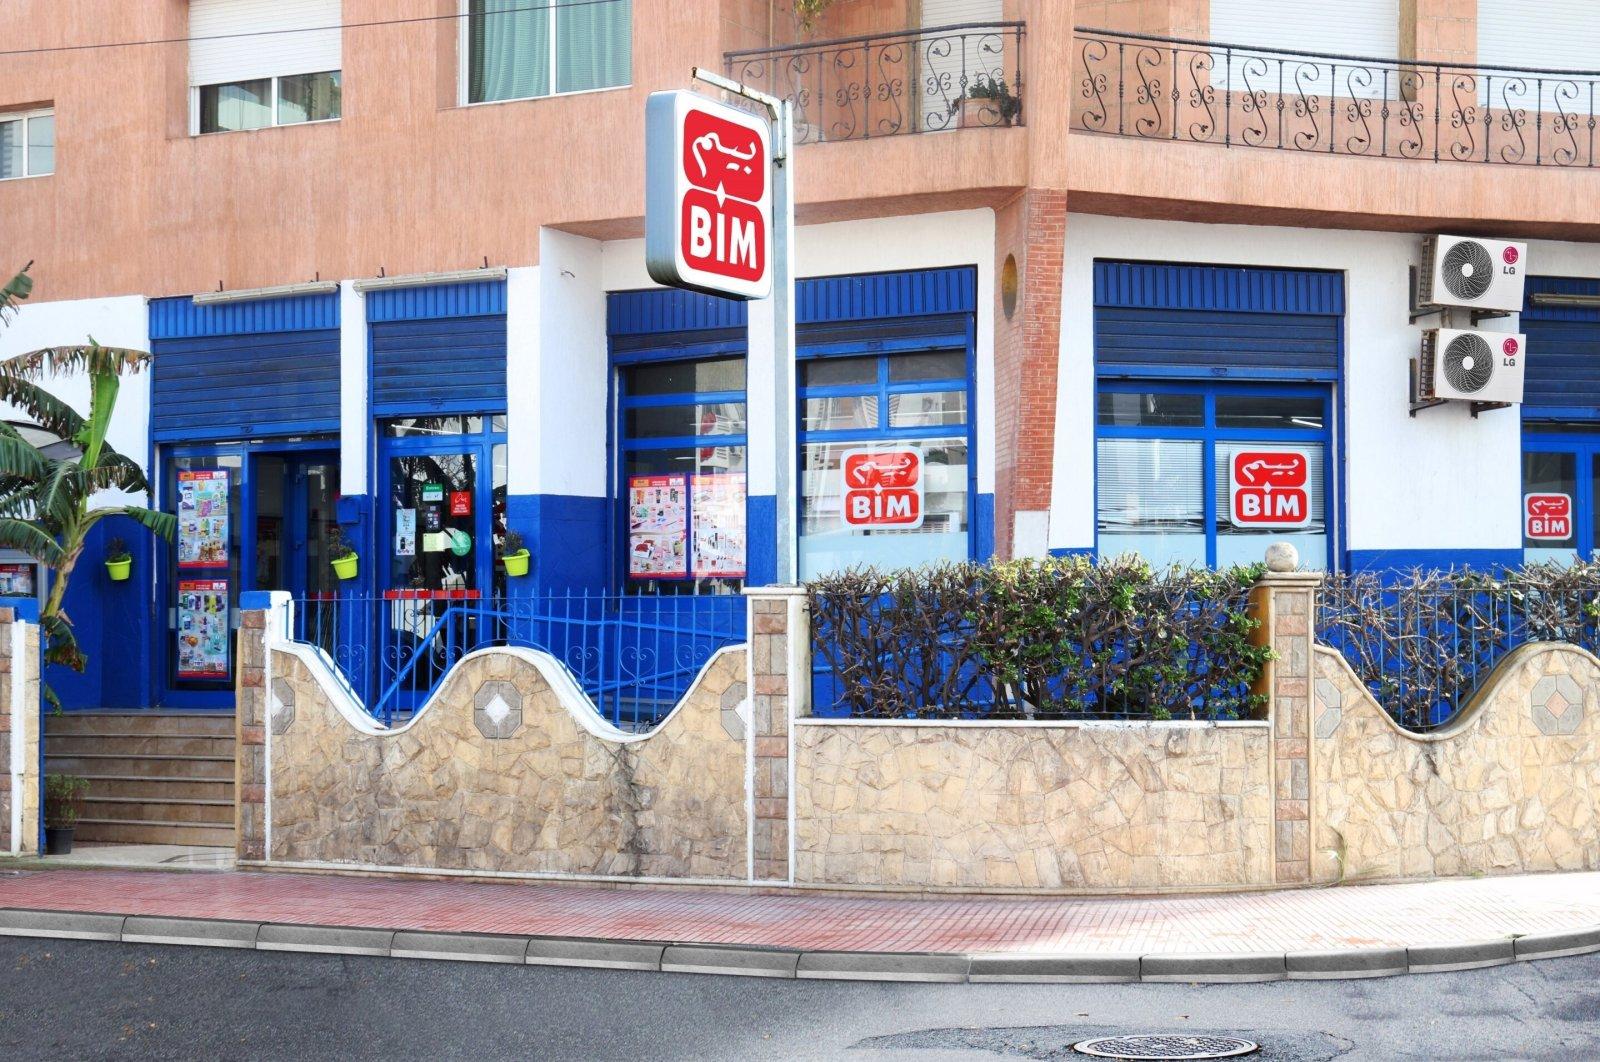 A BIM store is seen in Morocco, North Africa, Dec. 9, 2020. (Courtesy of BIM)